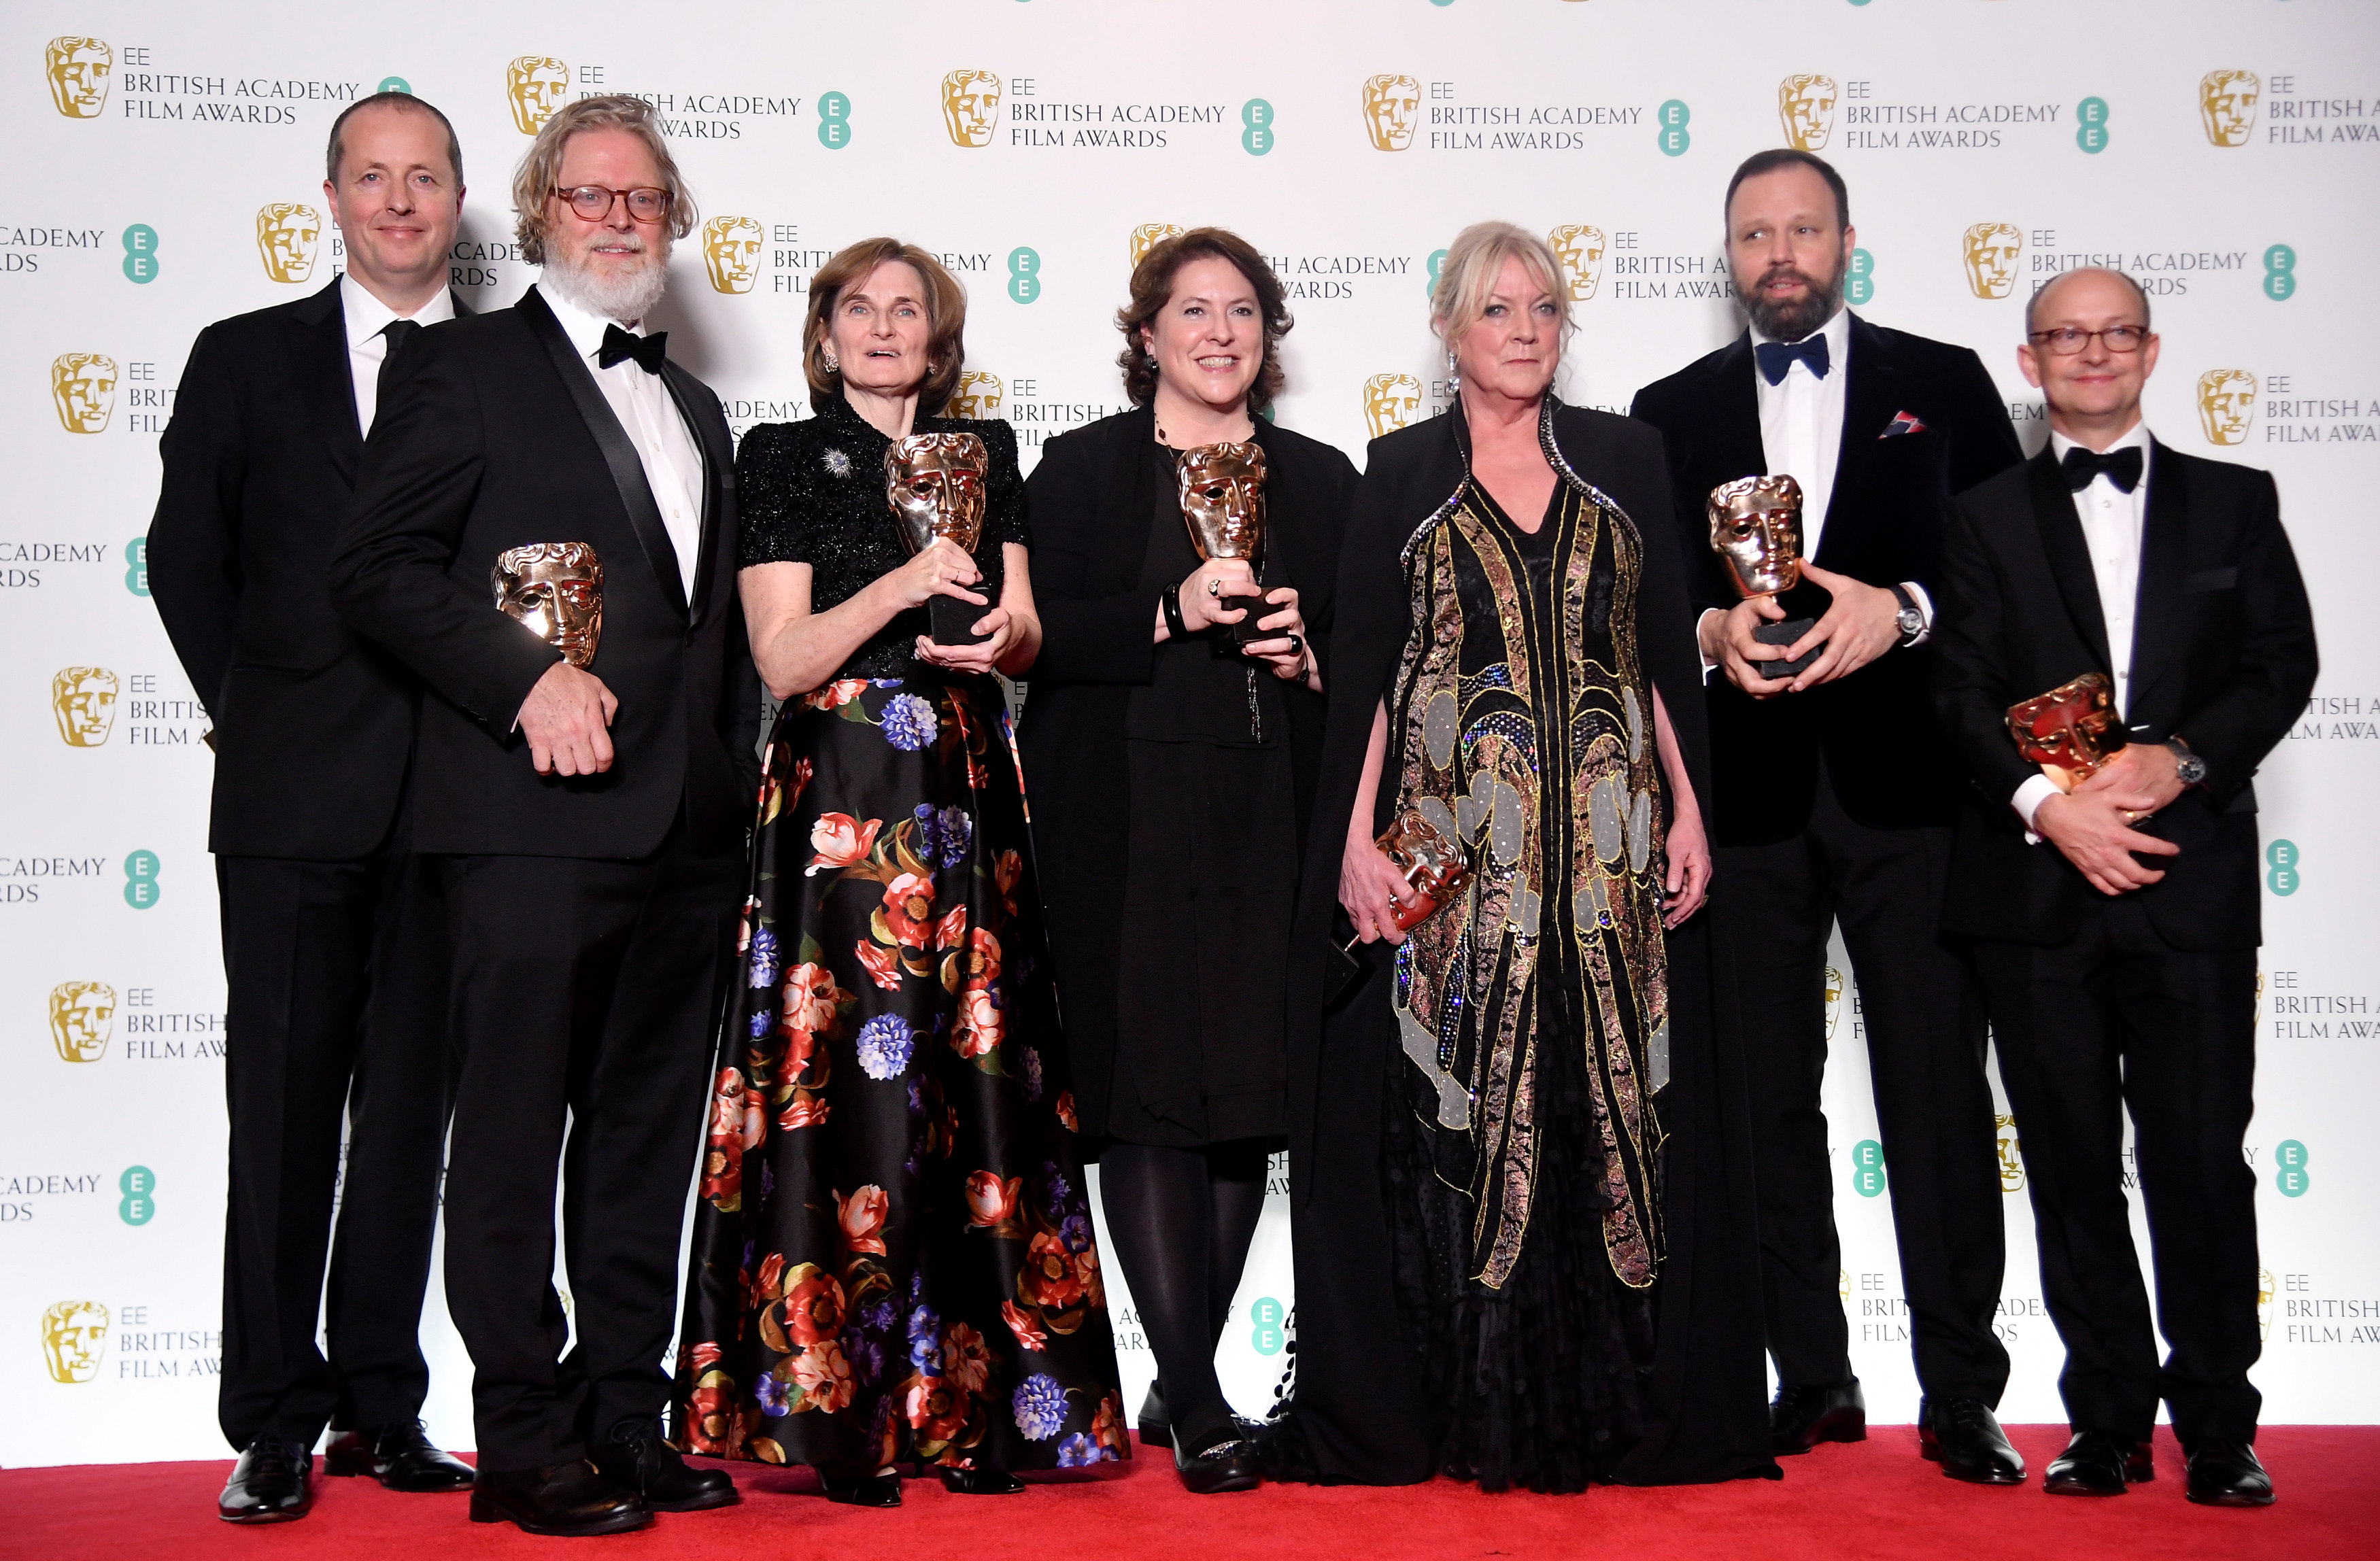 Andrew Lowe, Tony McNamara, Deborah Davis, Lee Magiday, Ceci Dempsey, Yorgos Lanthimos και Ed Guiney ποζάρουν κρατώντας τα βραβεία τους στα Βafta Awards 2019!